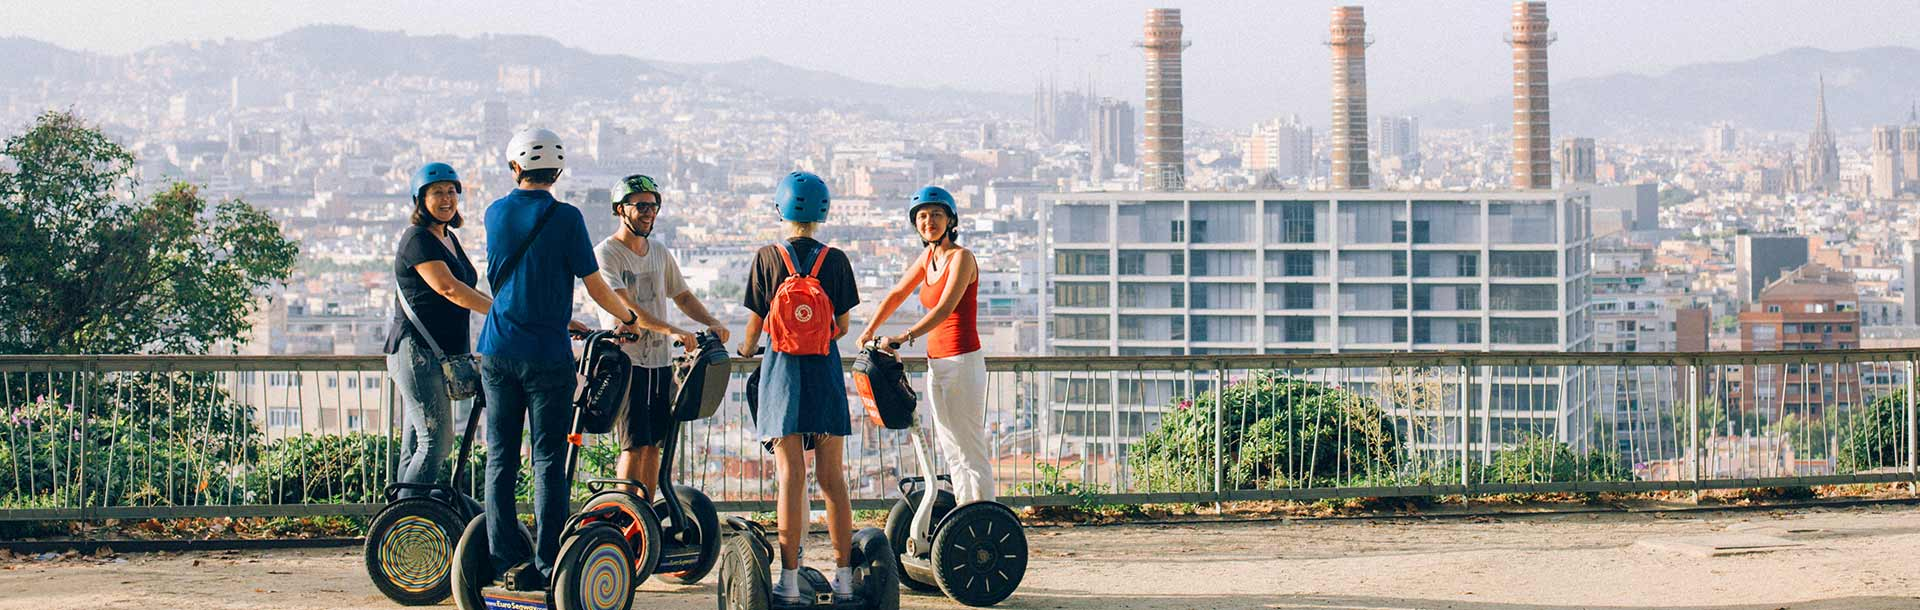 Montjuïc Sightseeing Tour